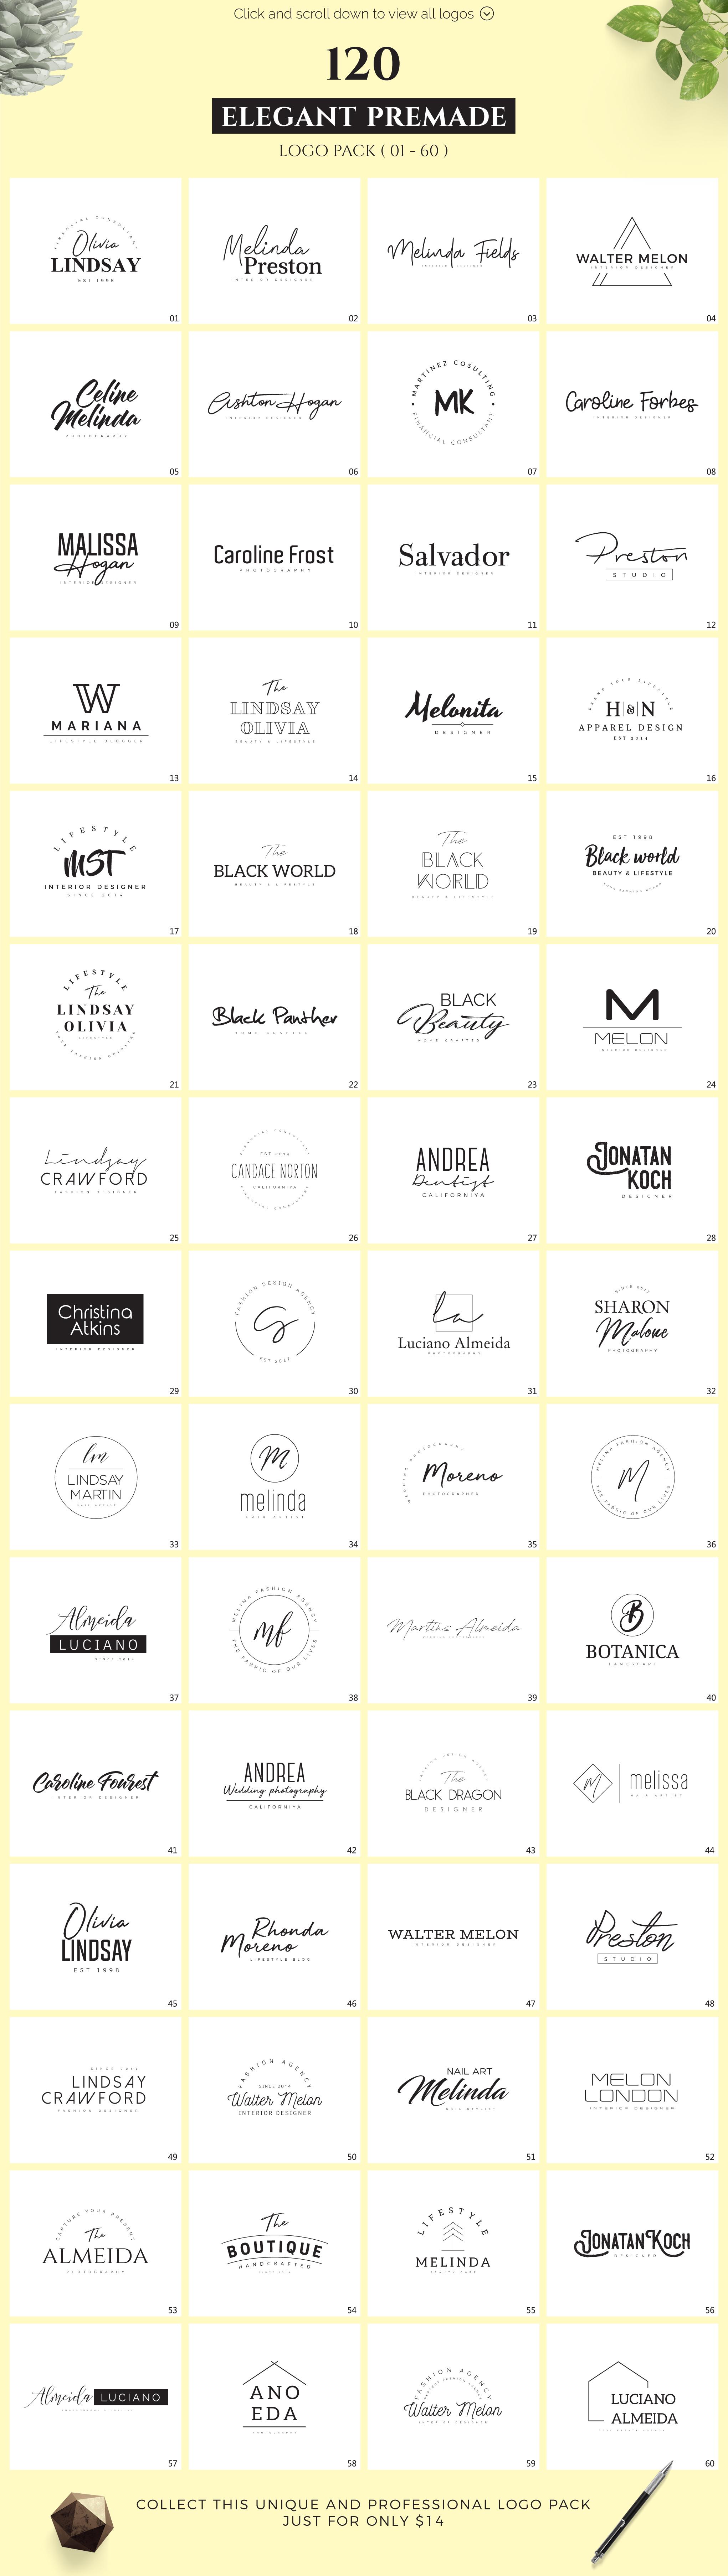 640 Premade Logos Mega Bundle example image 4